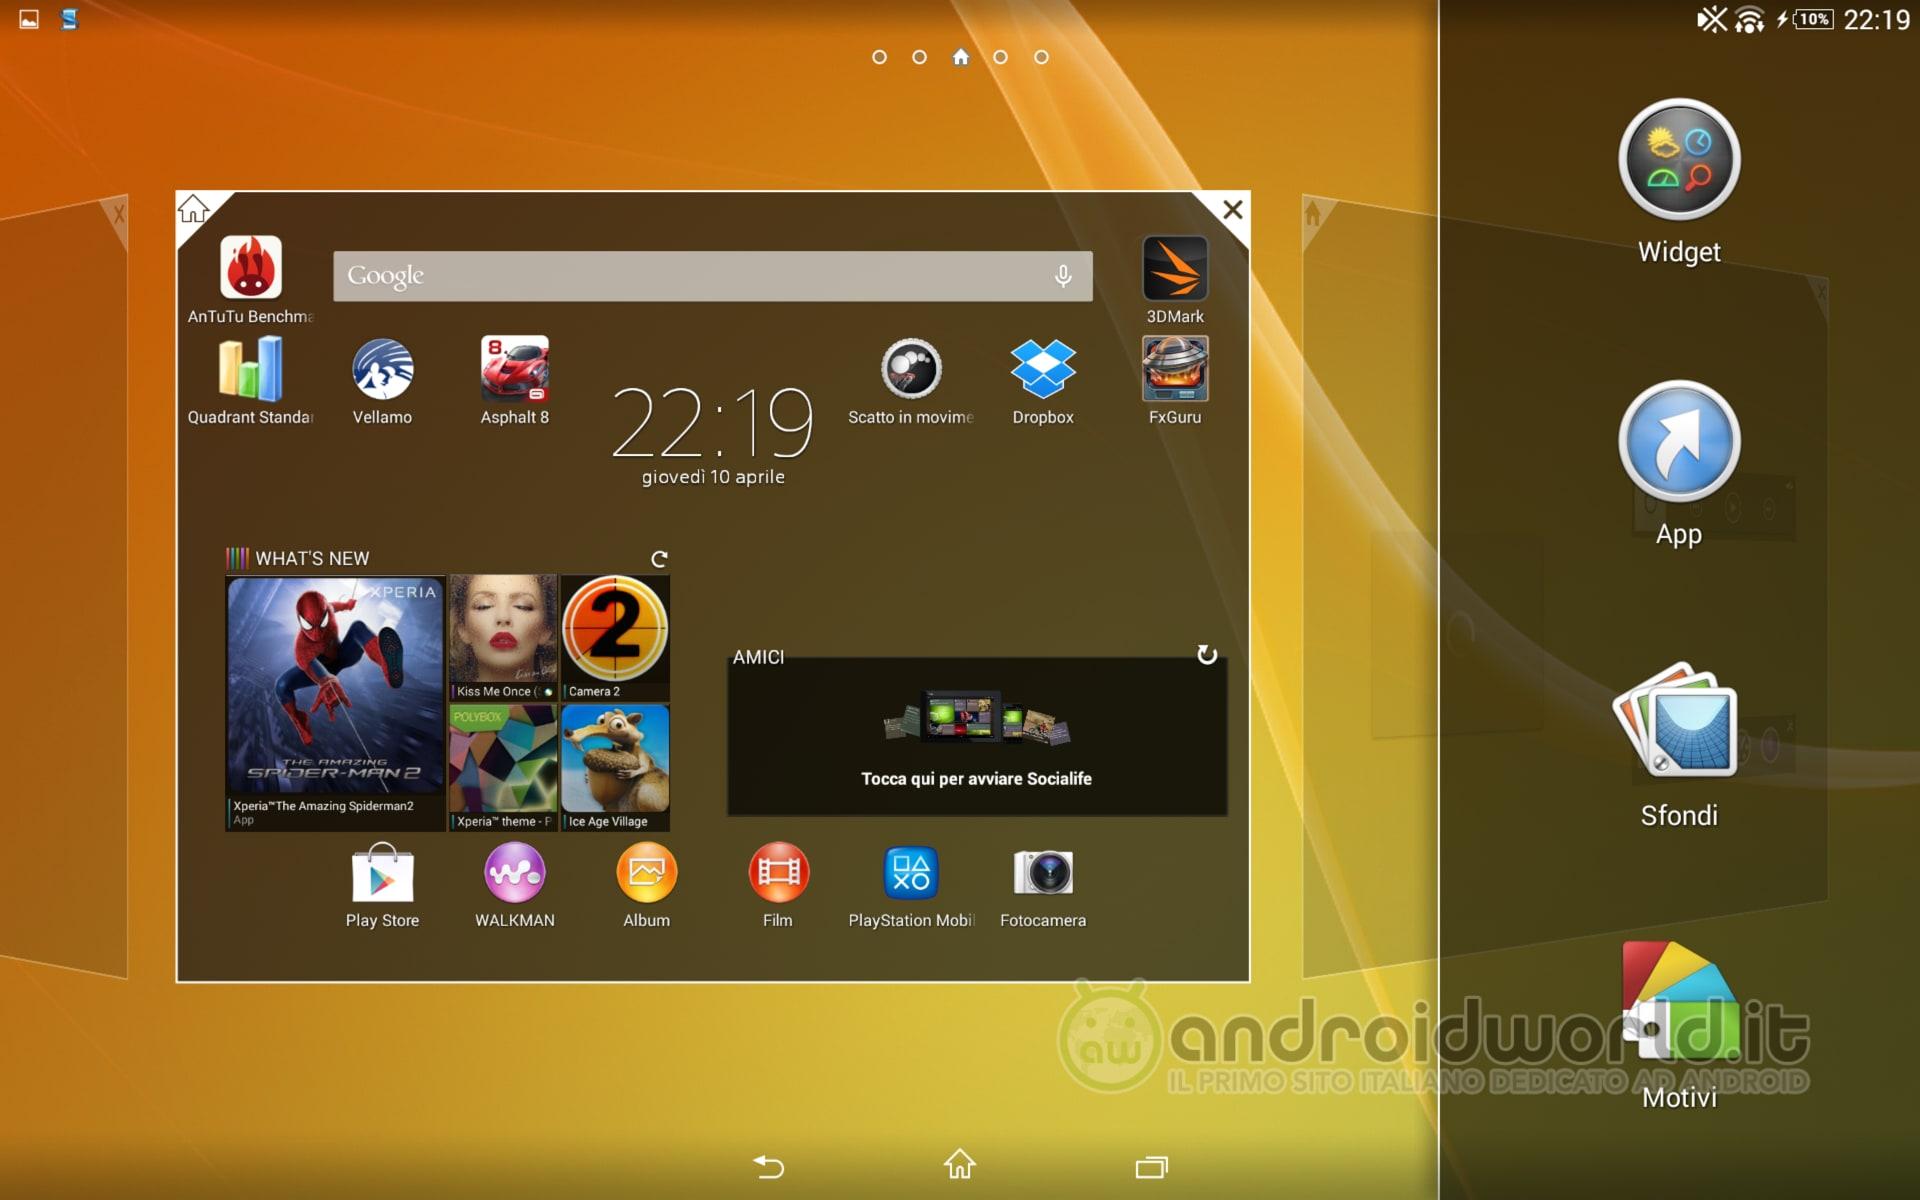 Xperia Z2 Tablet Widget